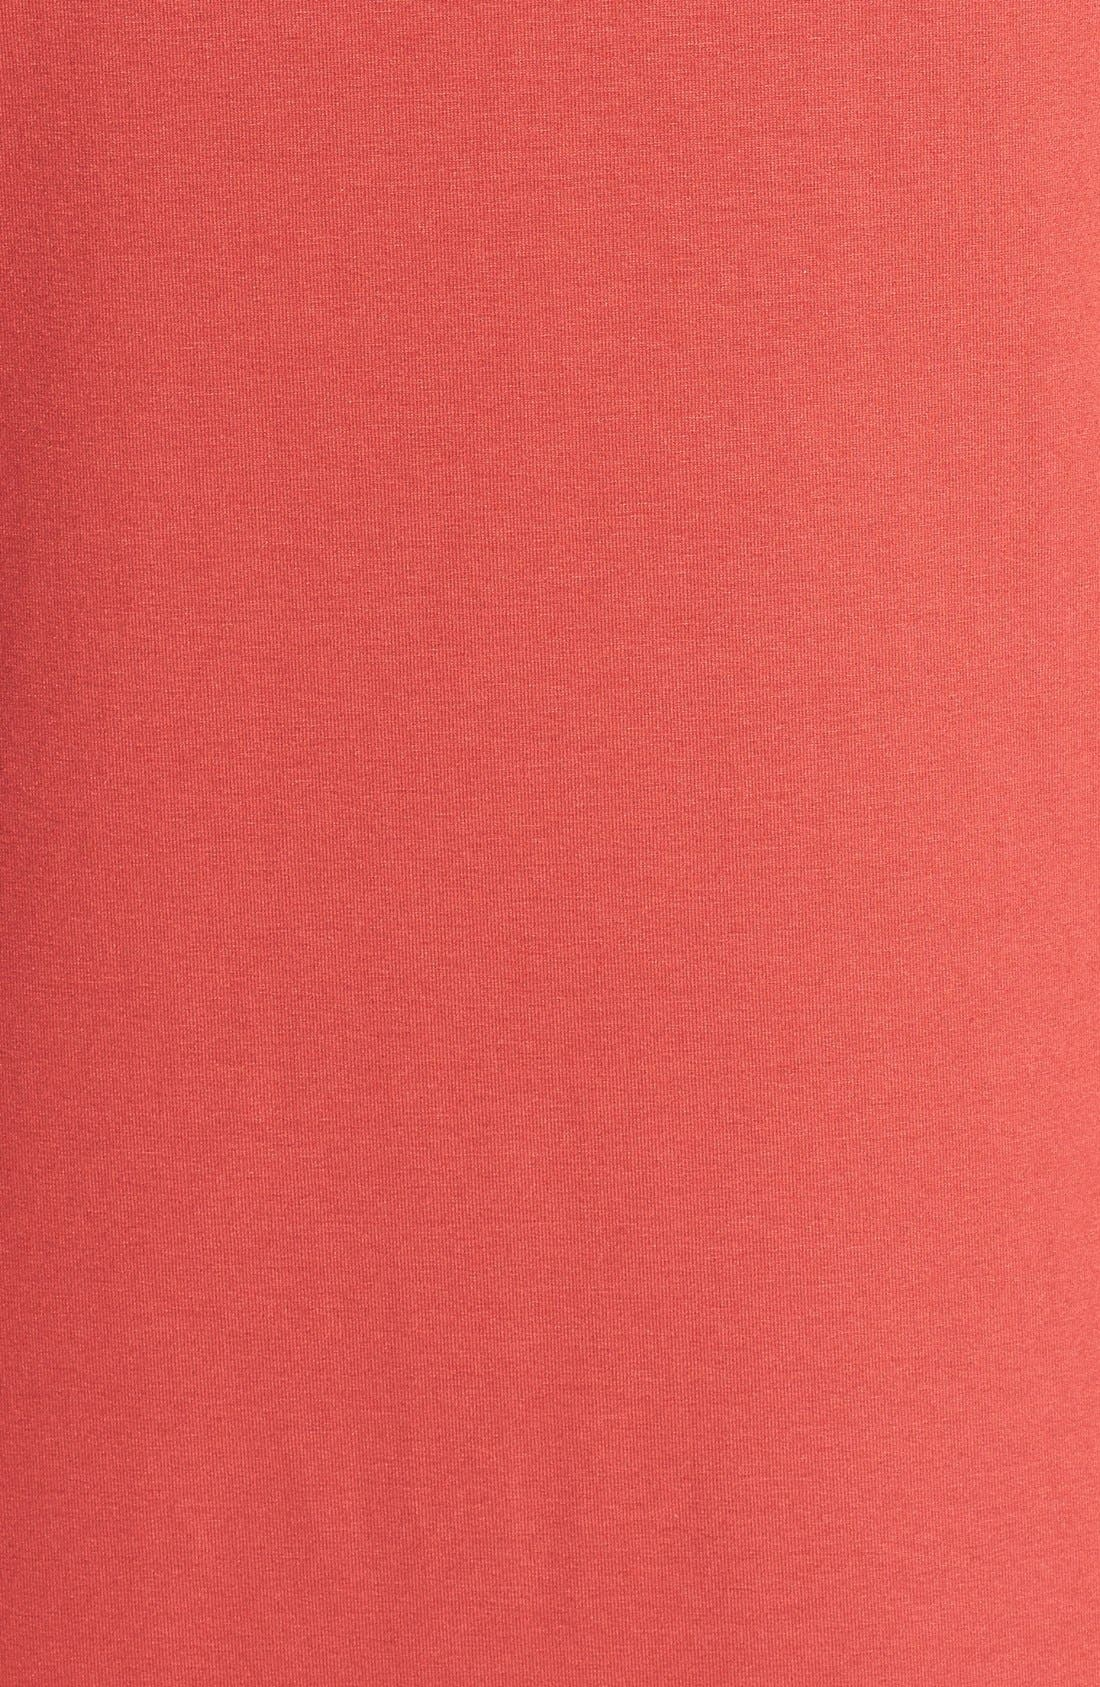 Alternate Image 3  - Eileen Fisher Cowl Neck Jersey Dress (Regular & Petite)